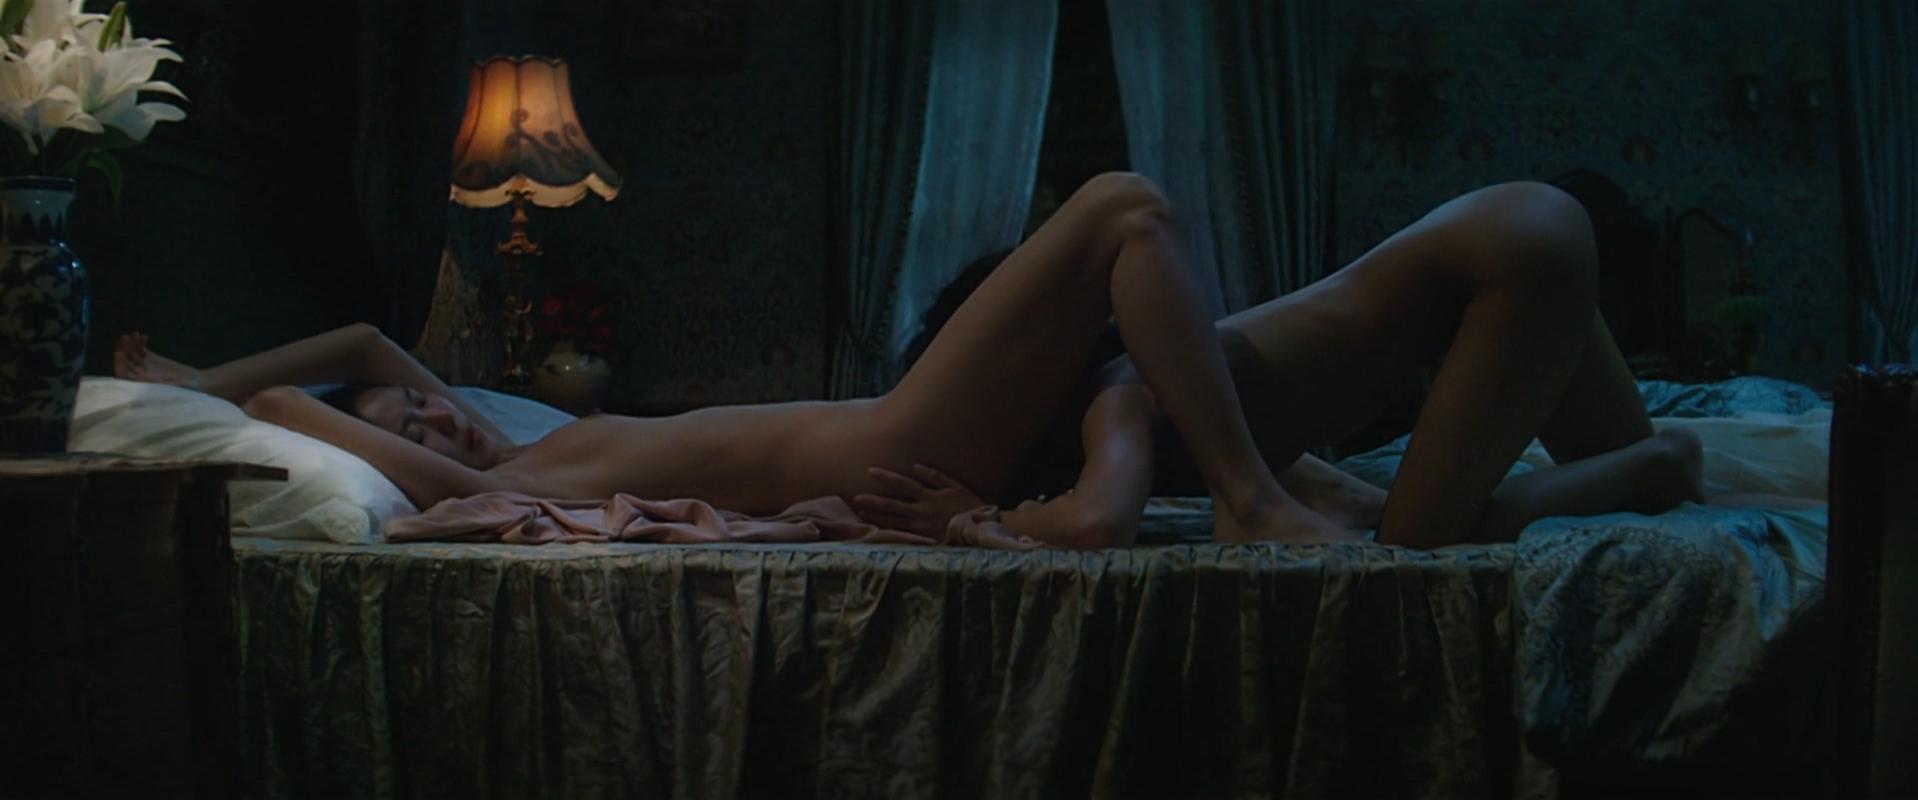 ri nudes